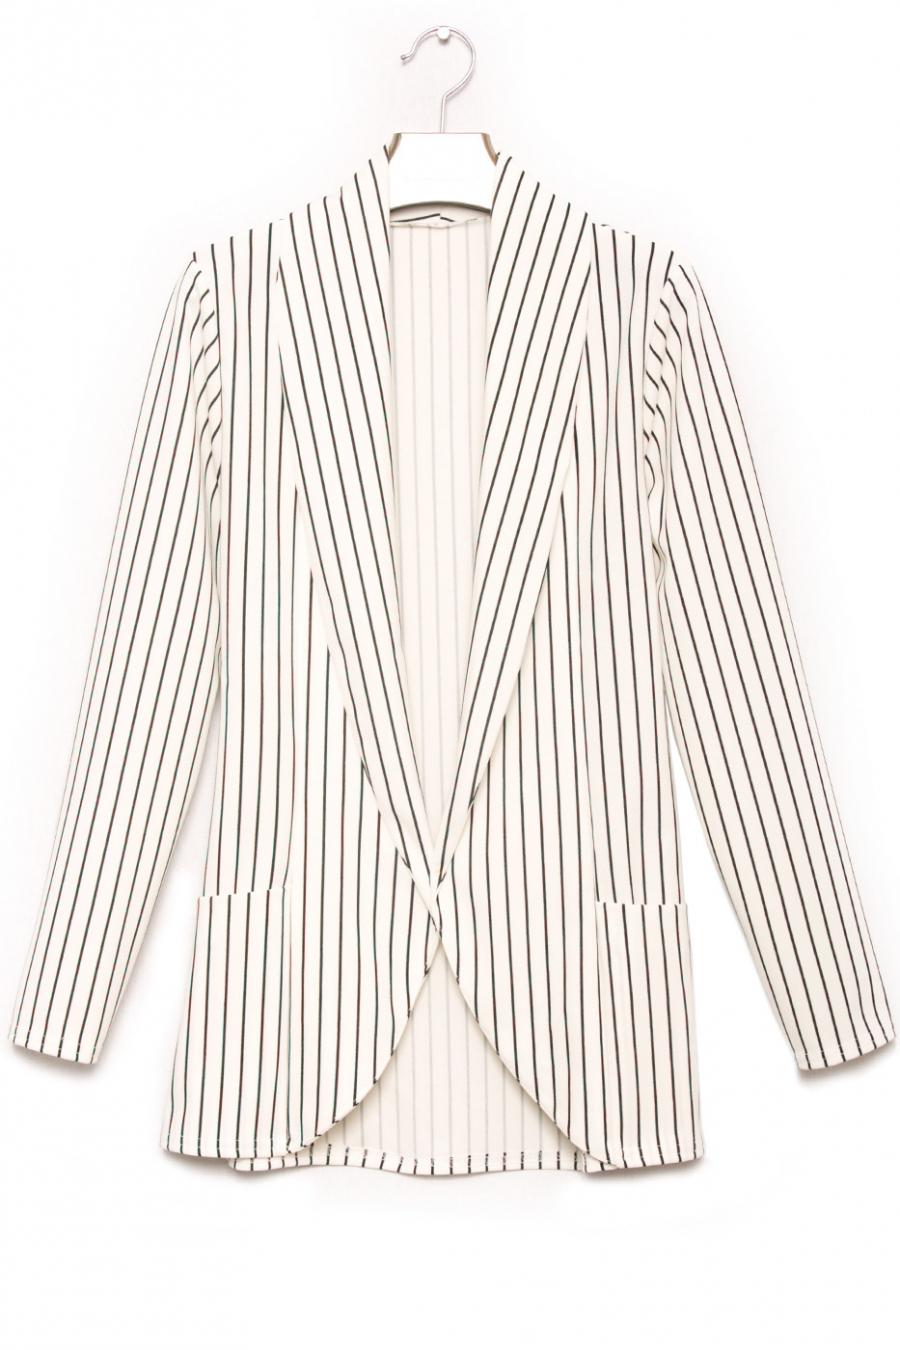 Blazer fashion blanc et noir avec poche. Veste femme fashion 1526